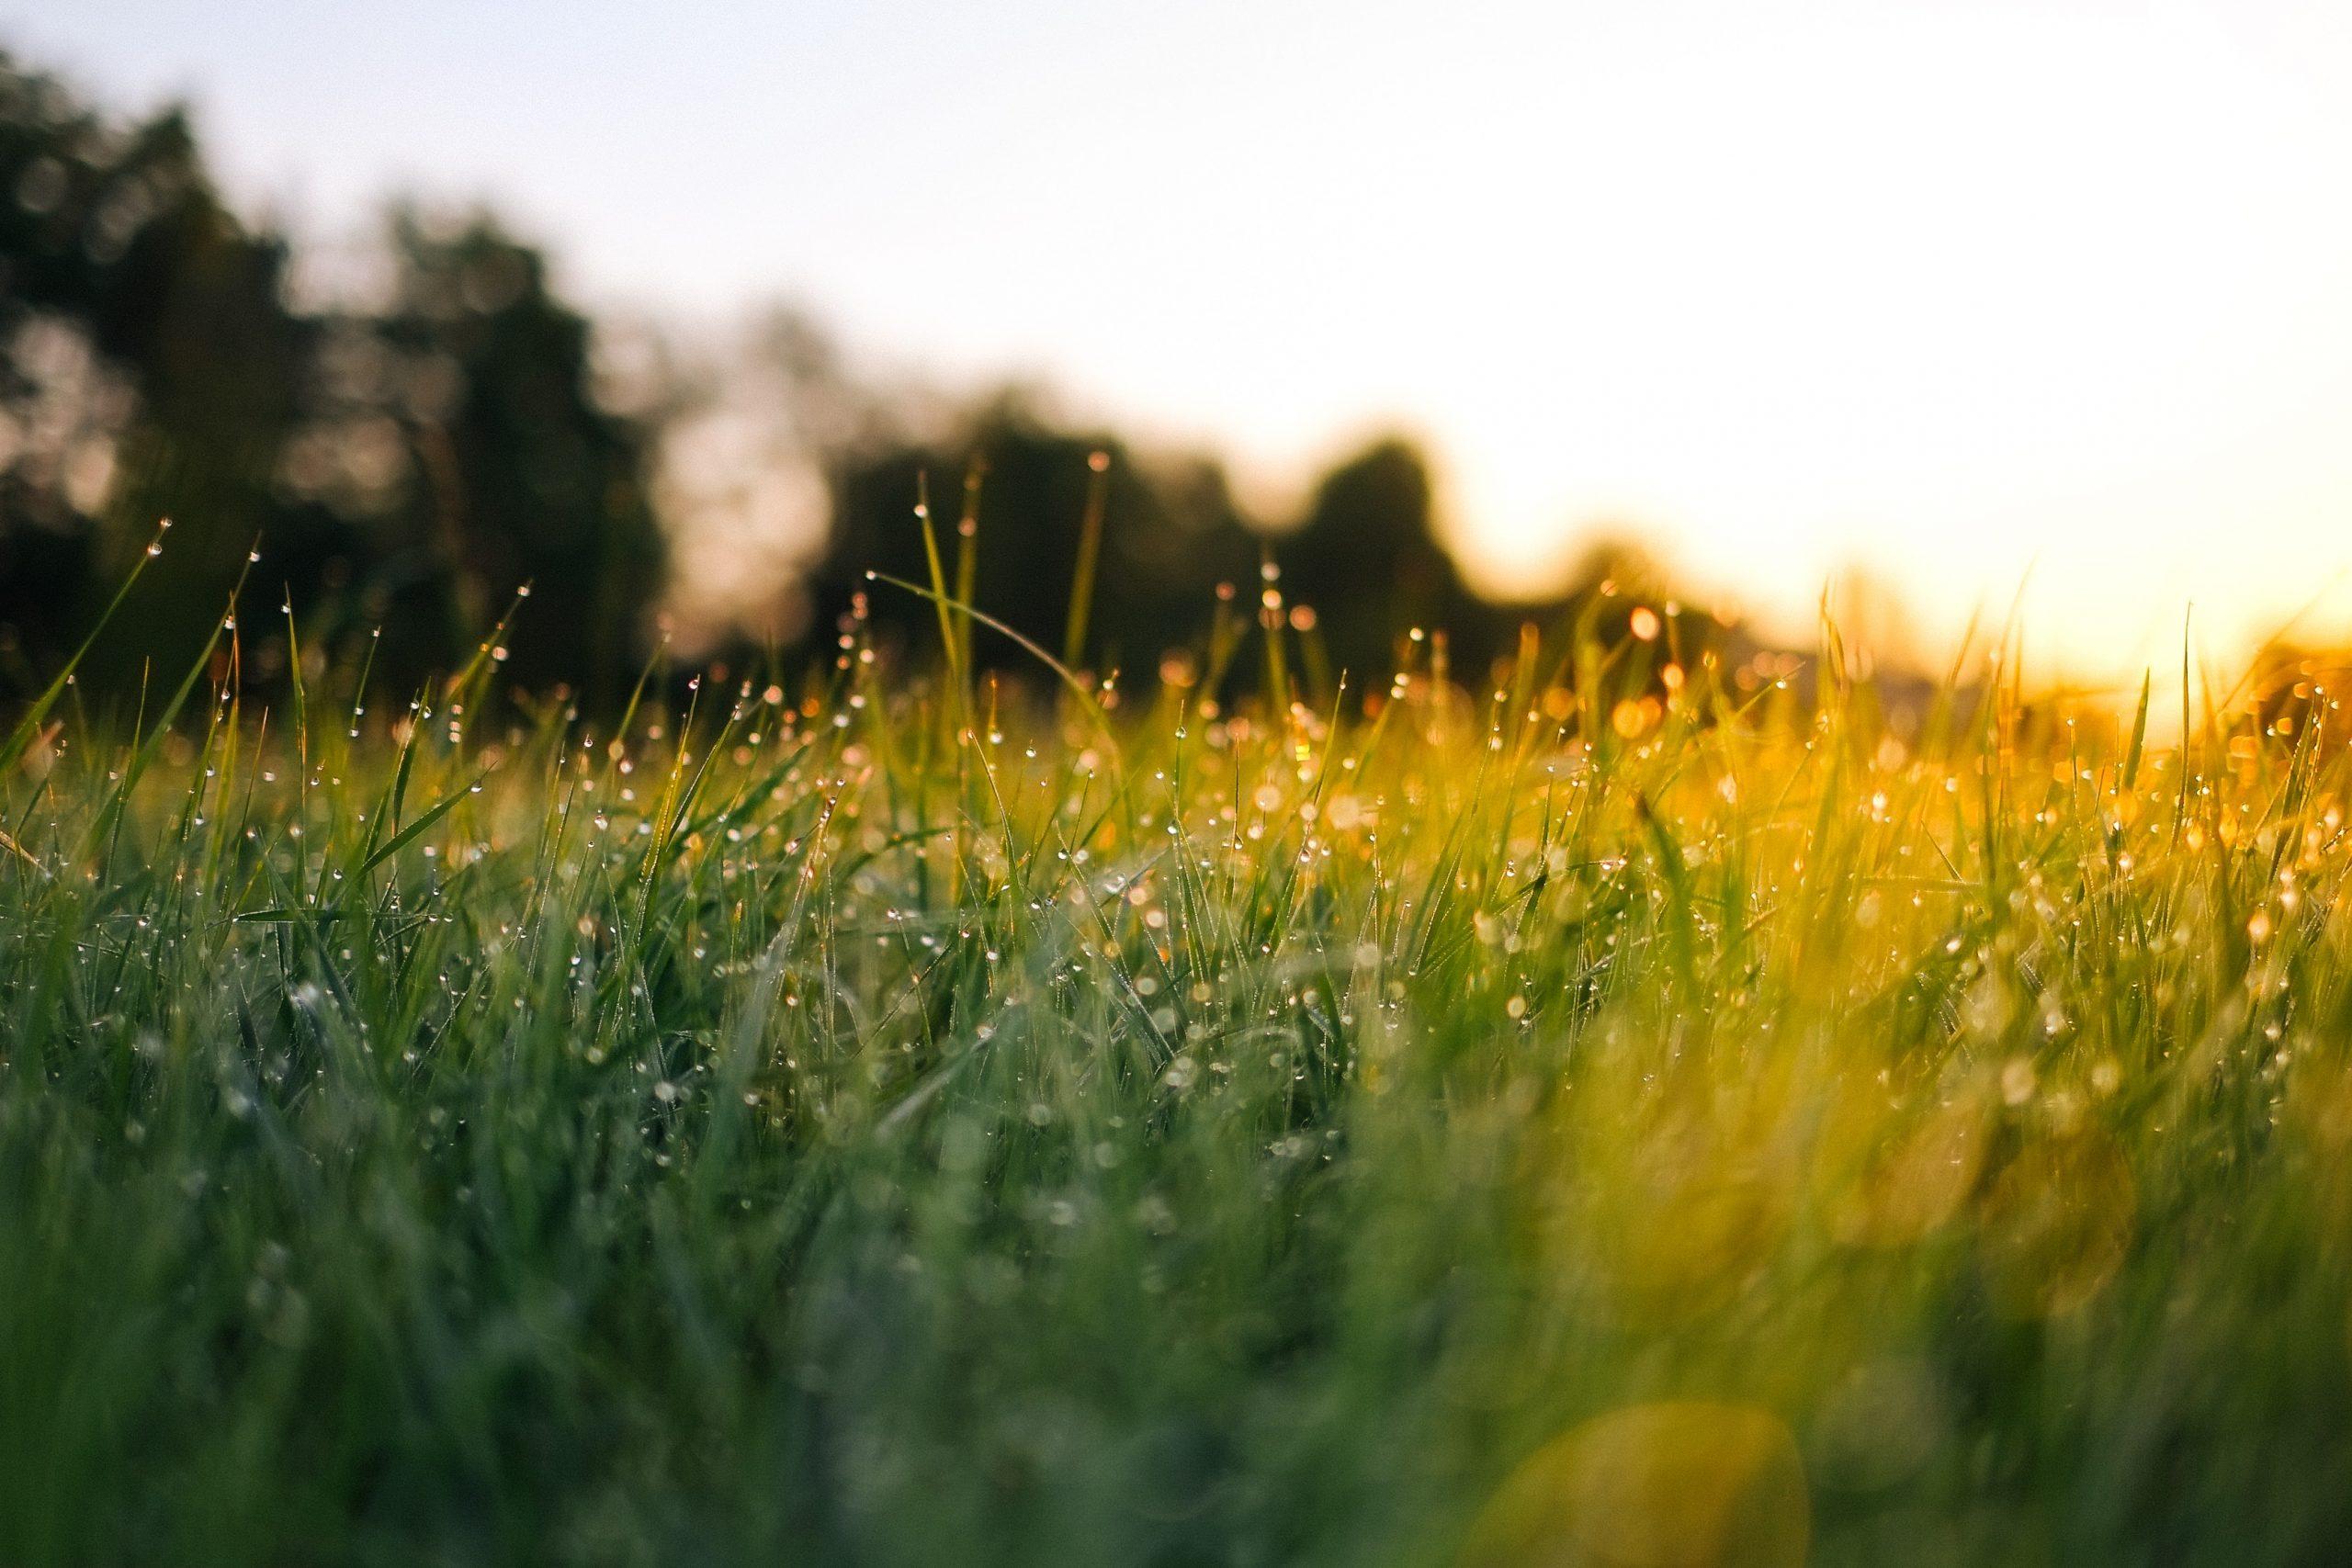 Gras inzaaien: hier houd je rekening mee